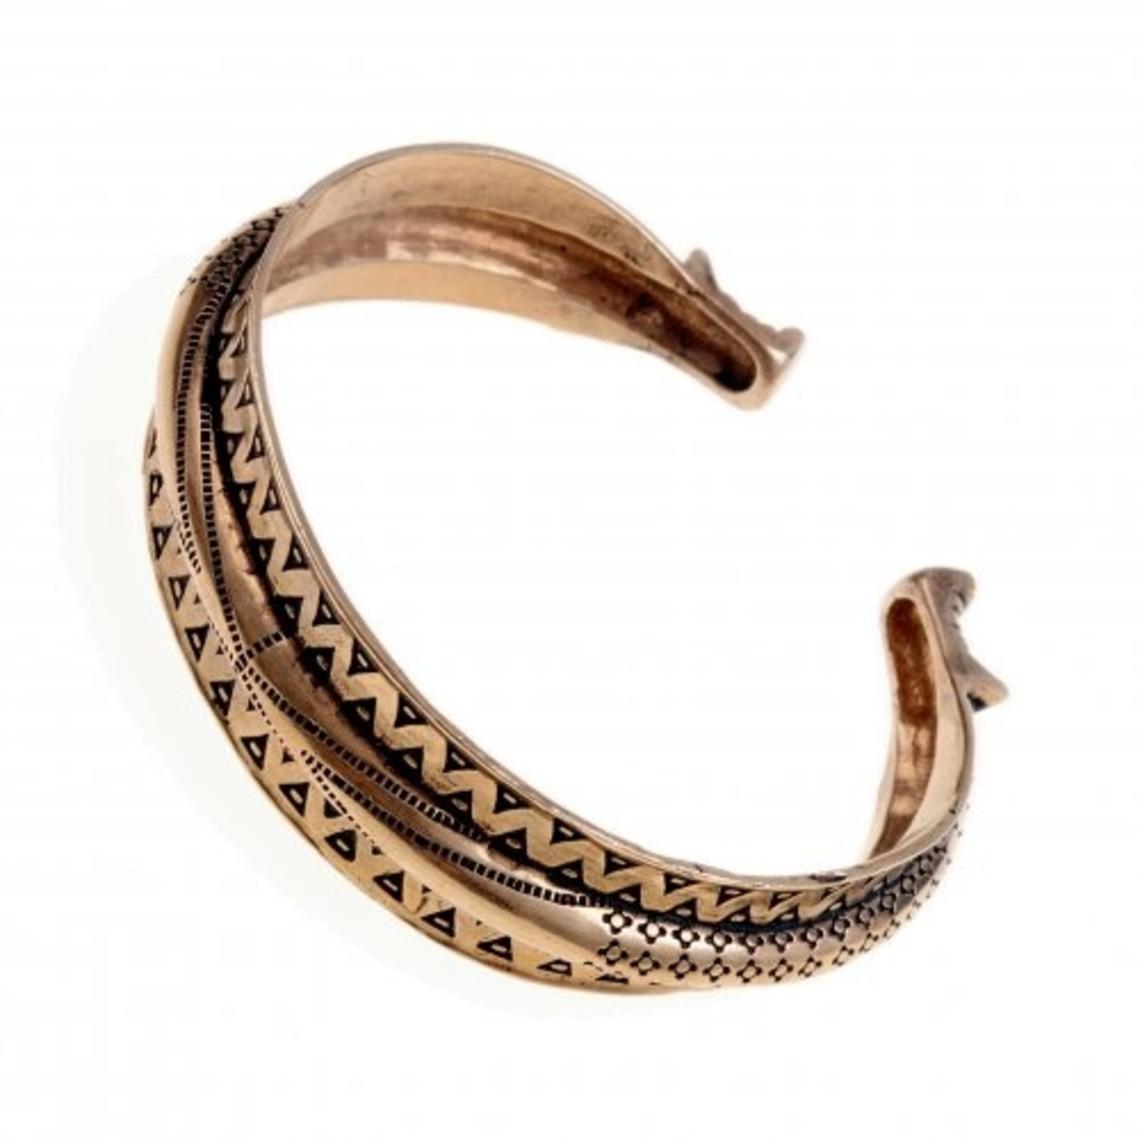 10de eeuwse Rusvik armband